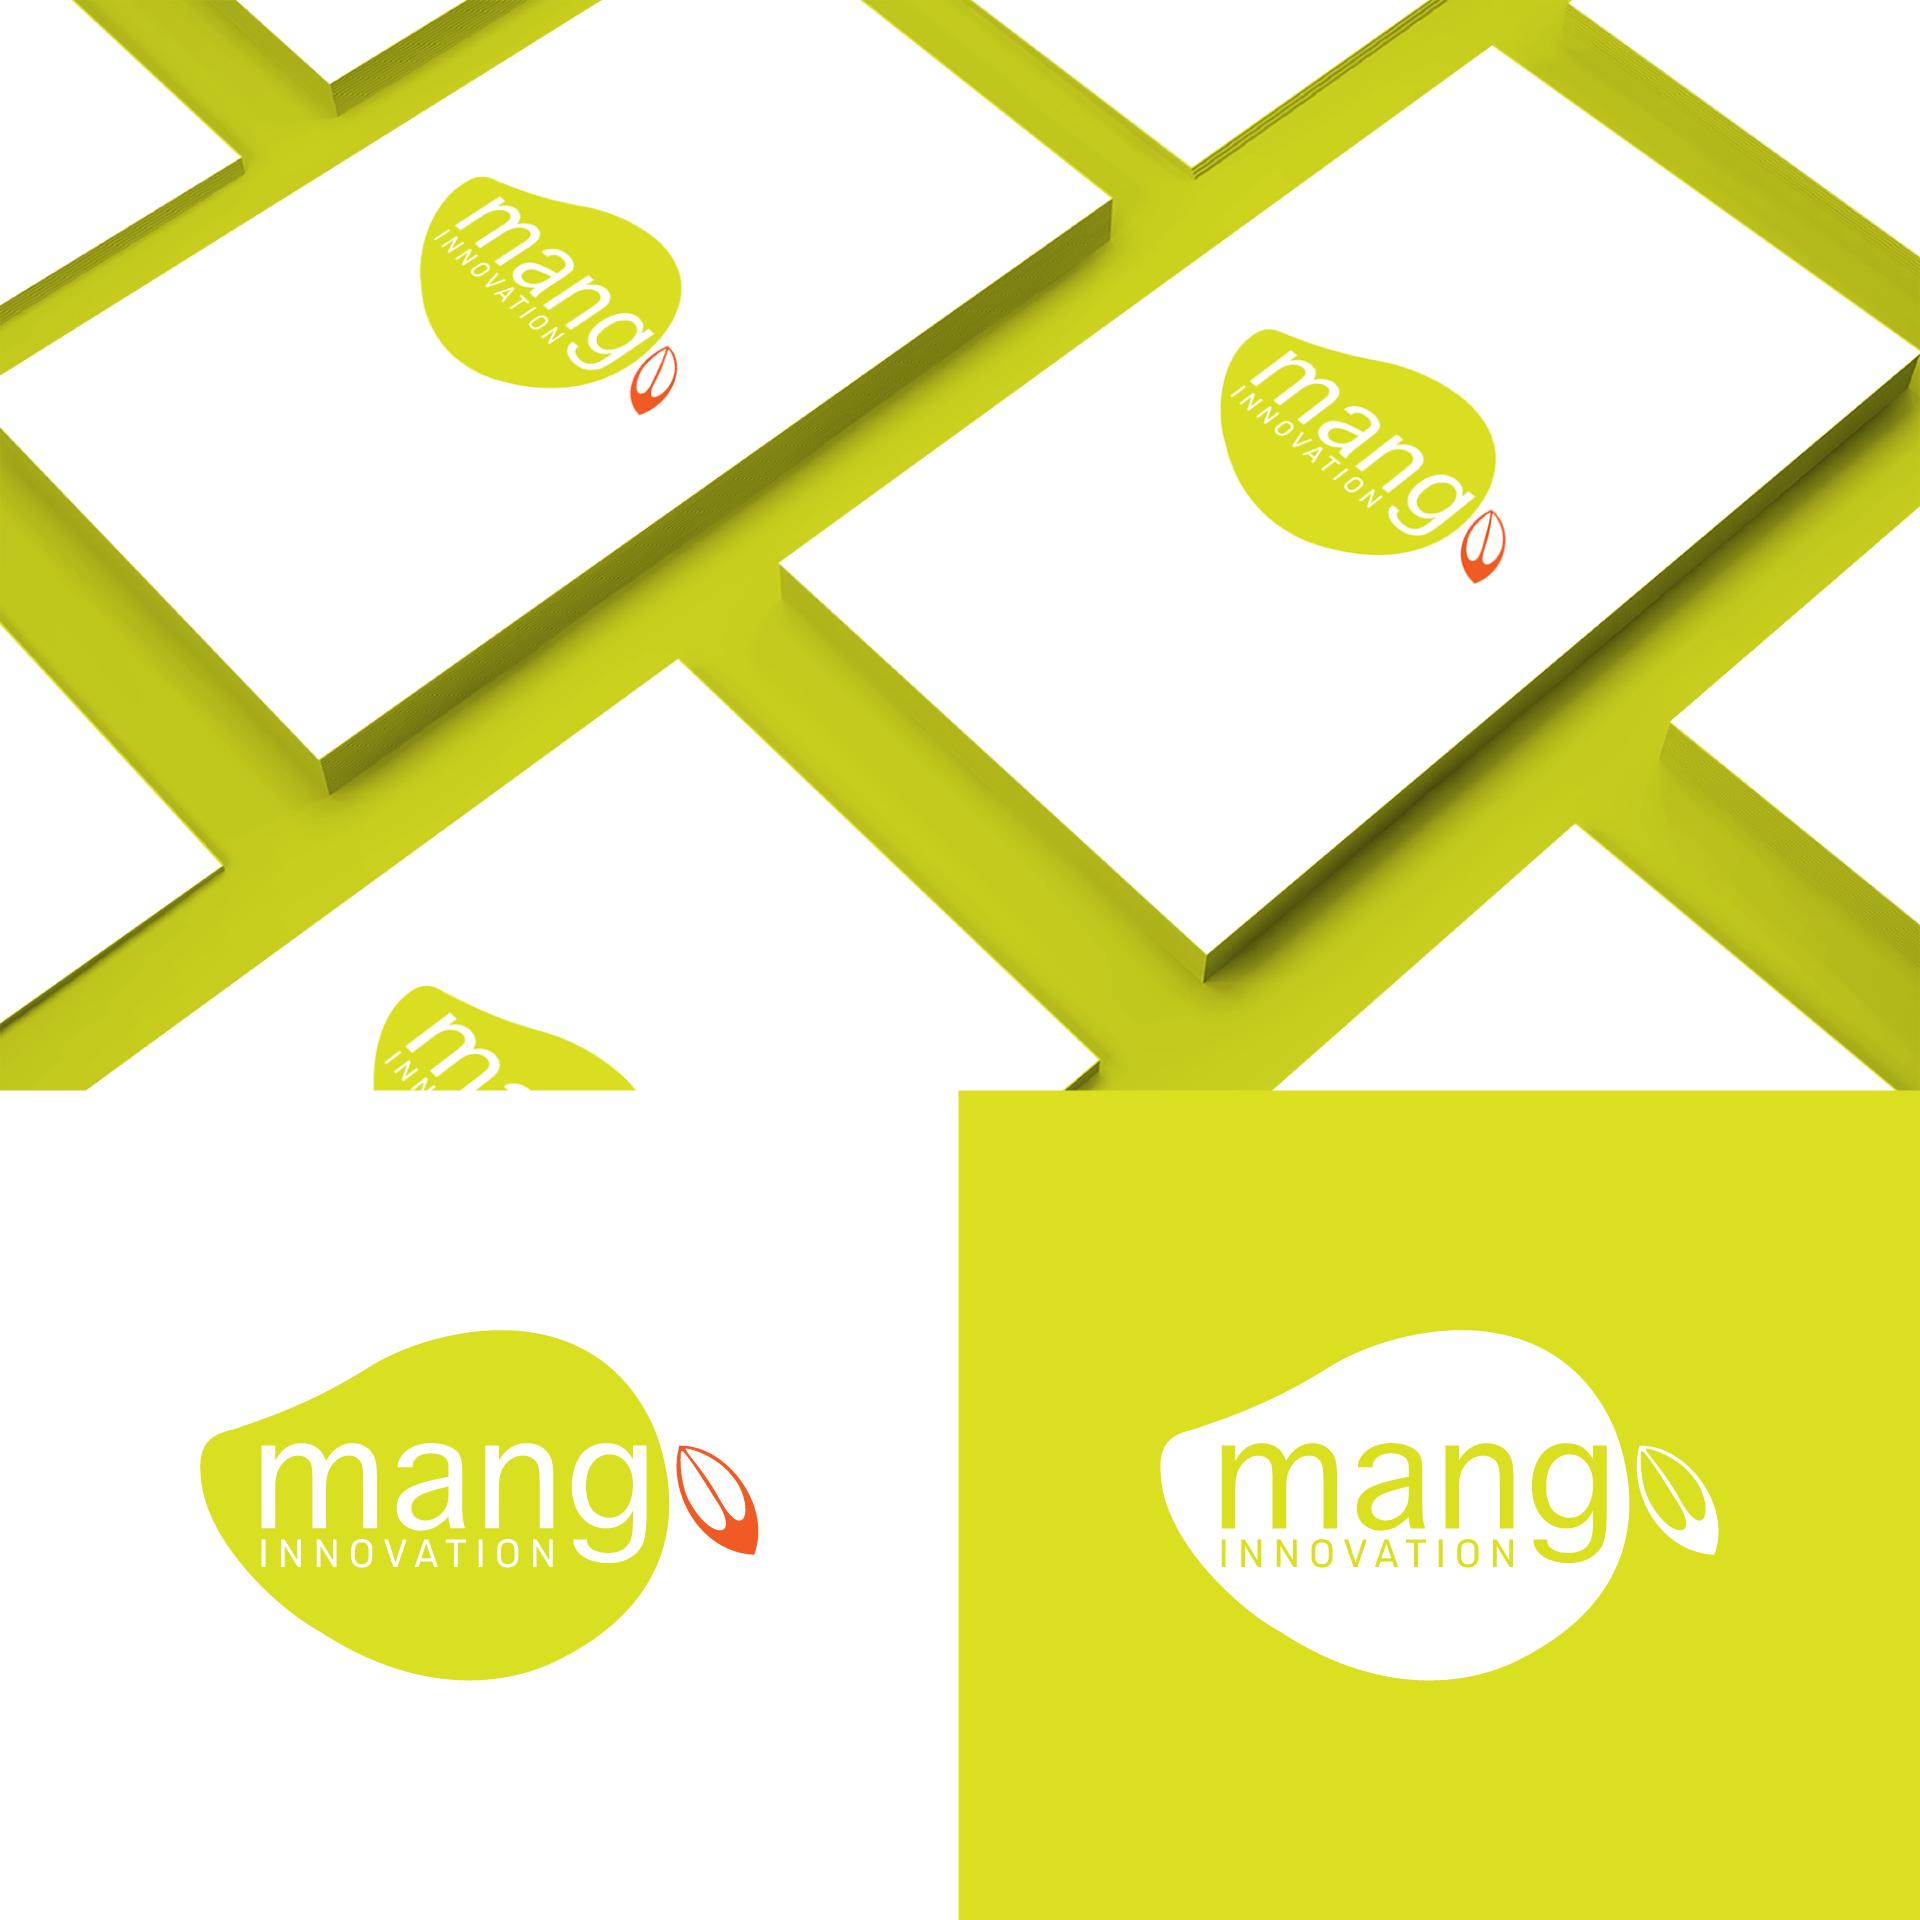 mango-square-01.png